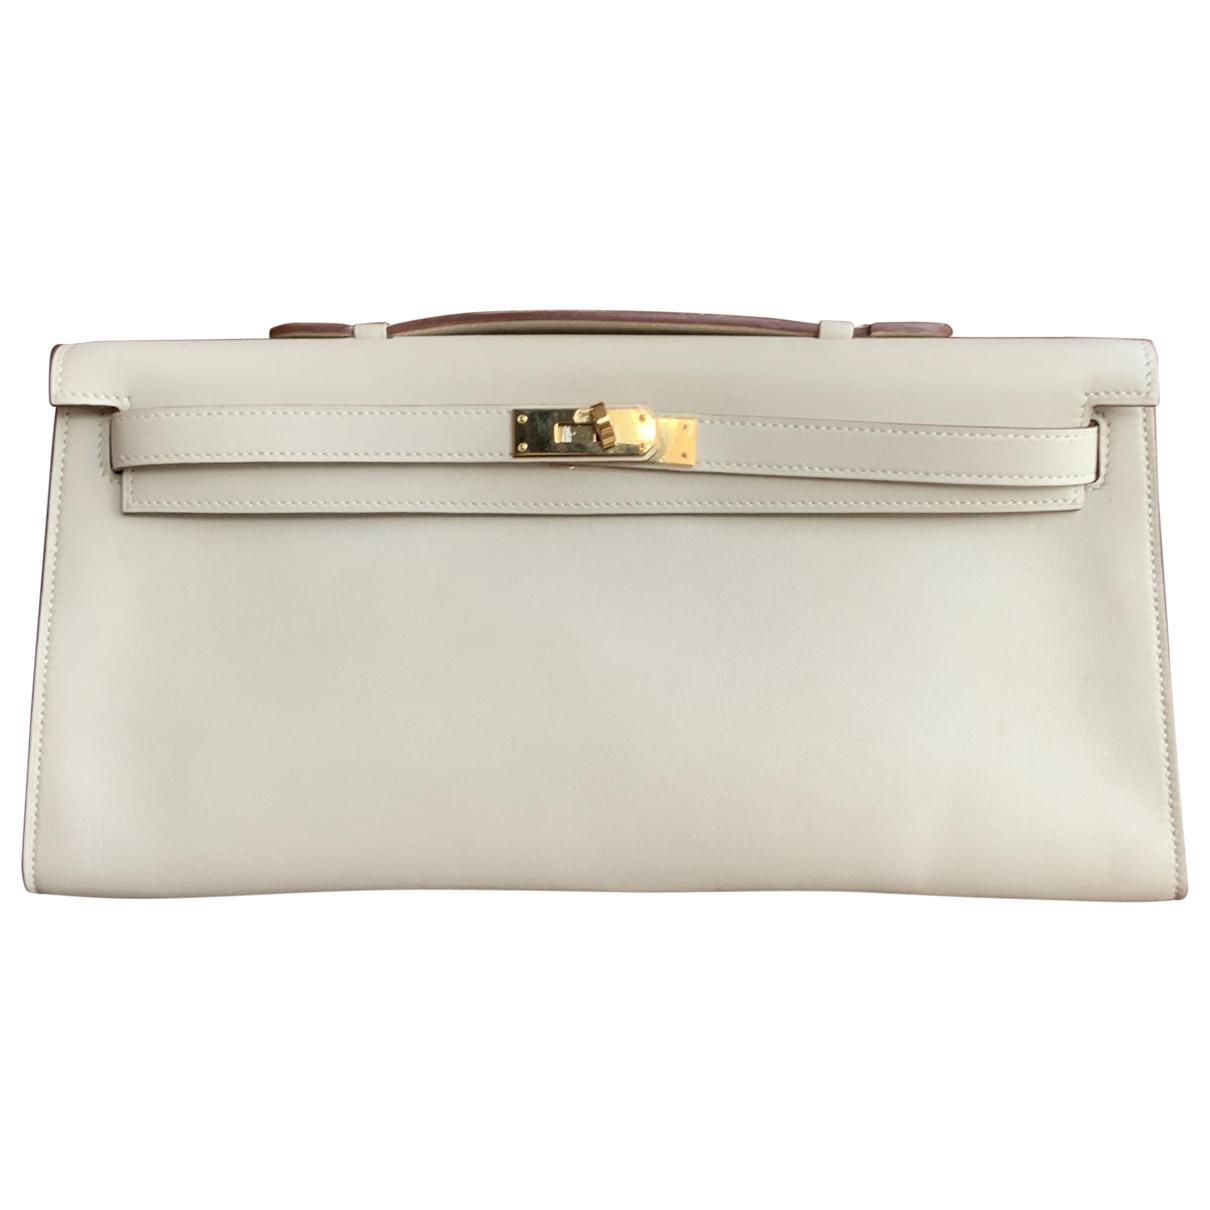 Hermes \N Handtasche in  Ecru Leder